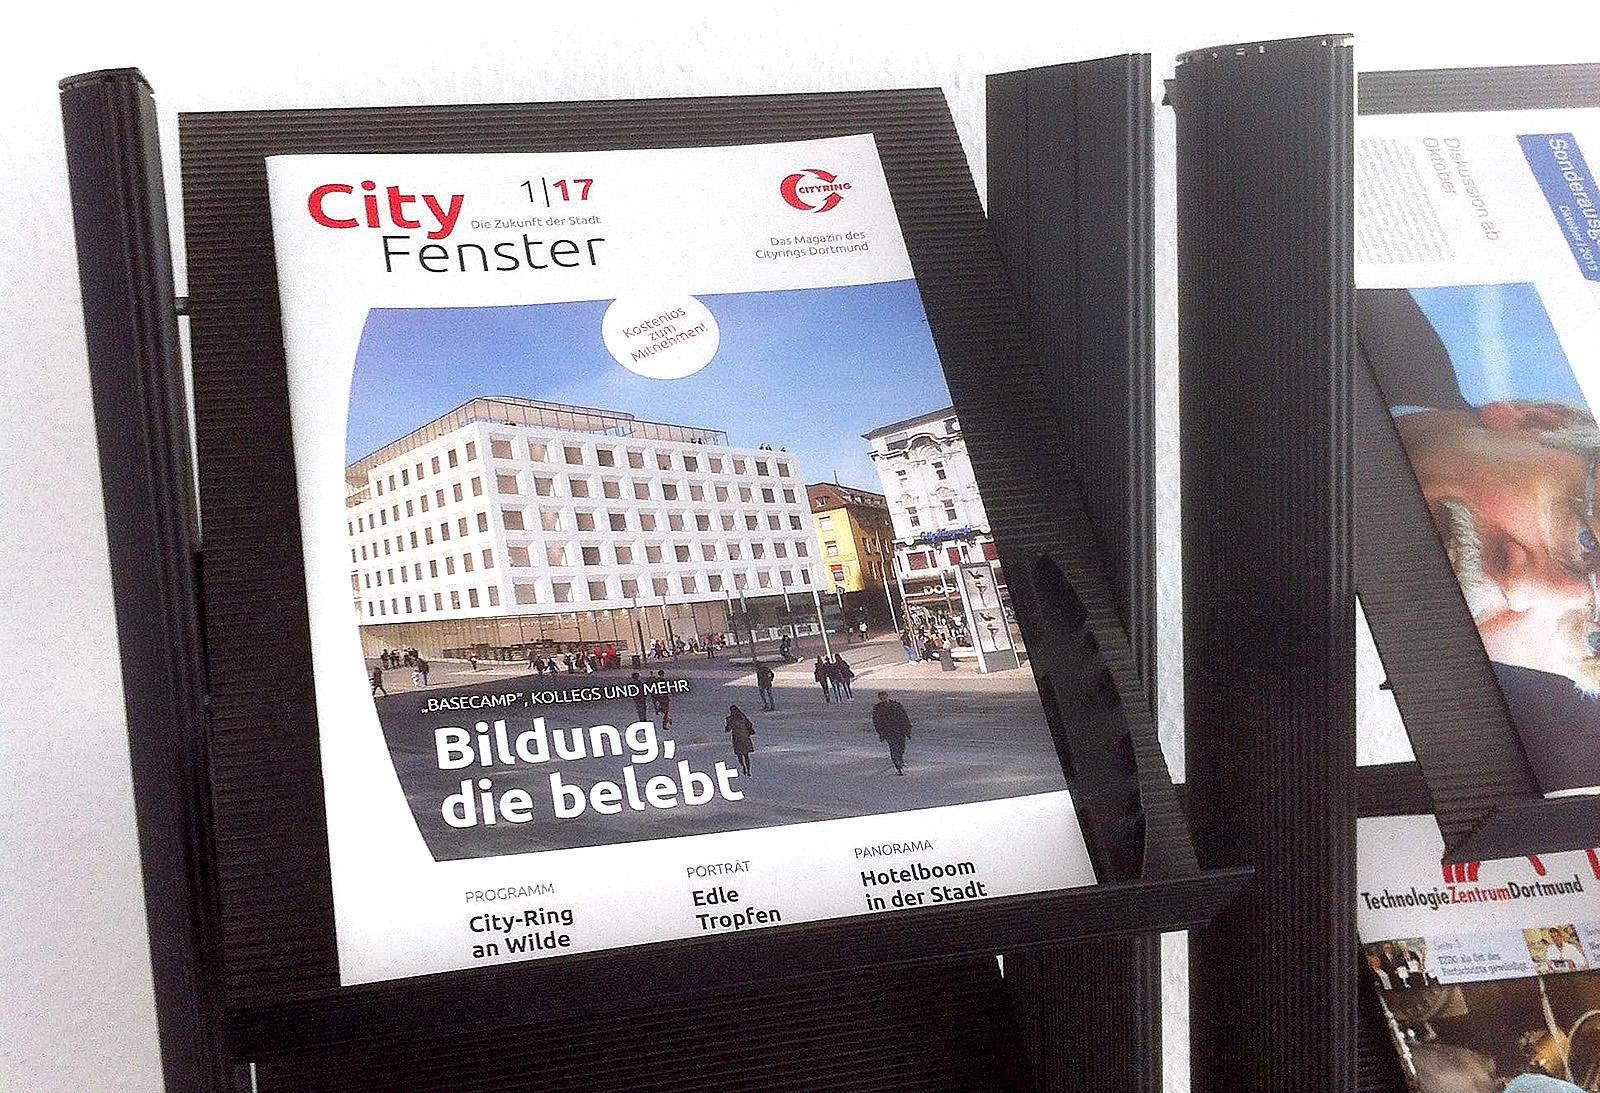 news-cityfenster-1-17-2